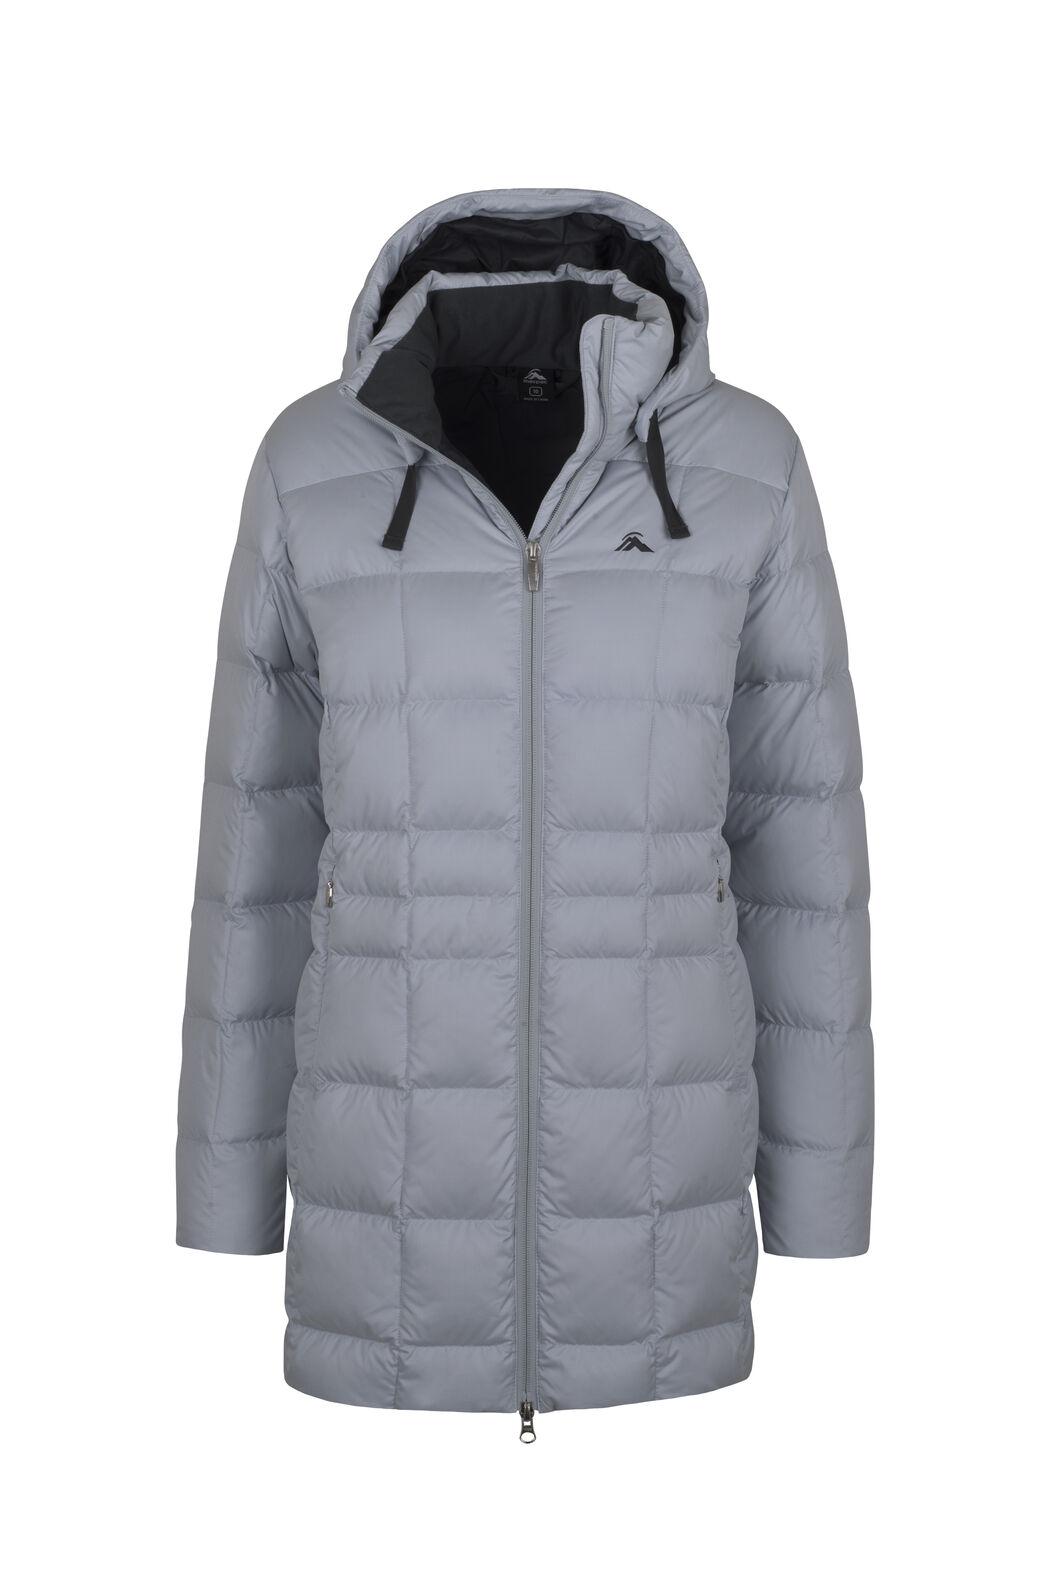 Macpac Aurora Down Coat V3 - Women's, Pearl Blue, hi-res